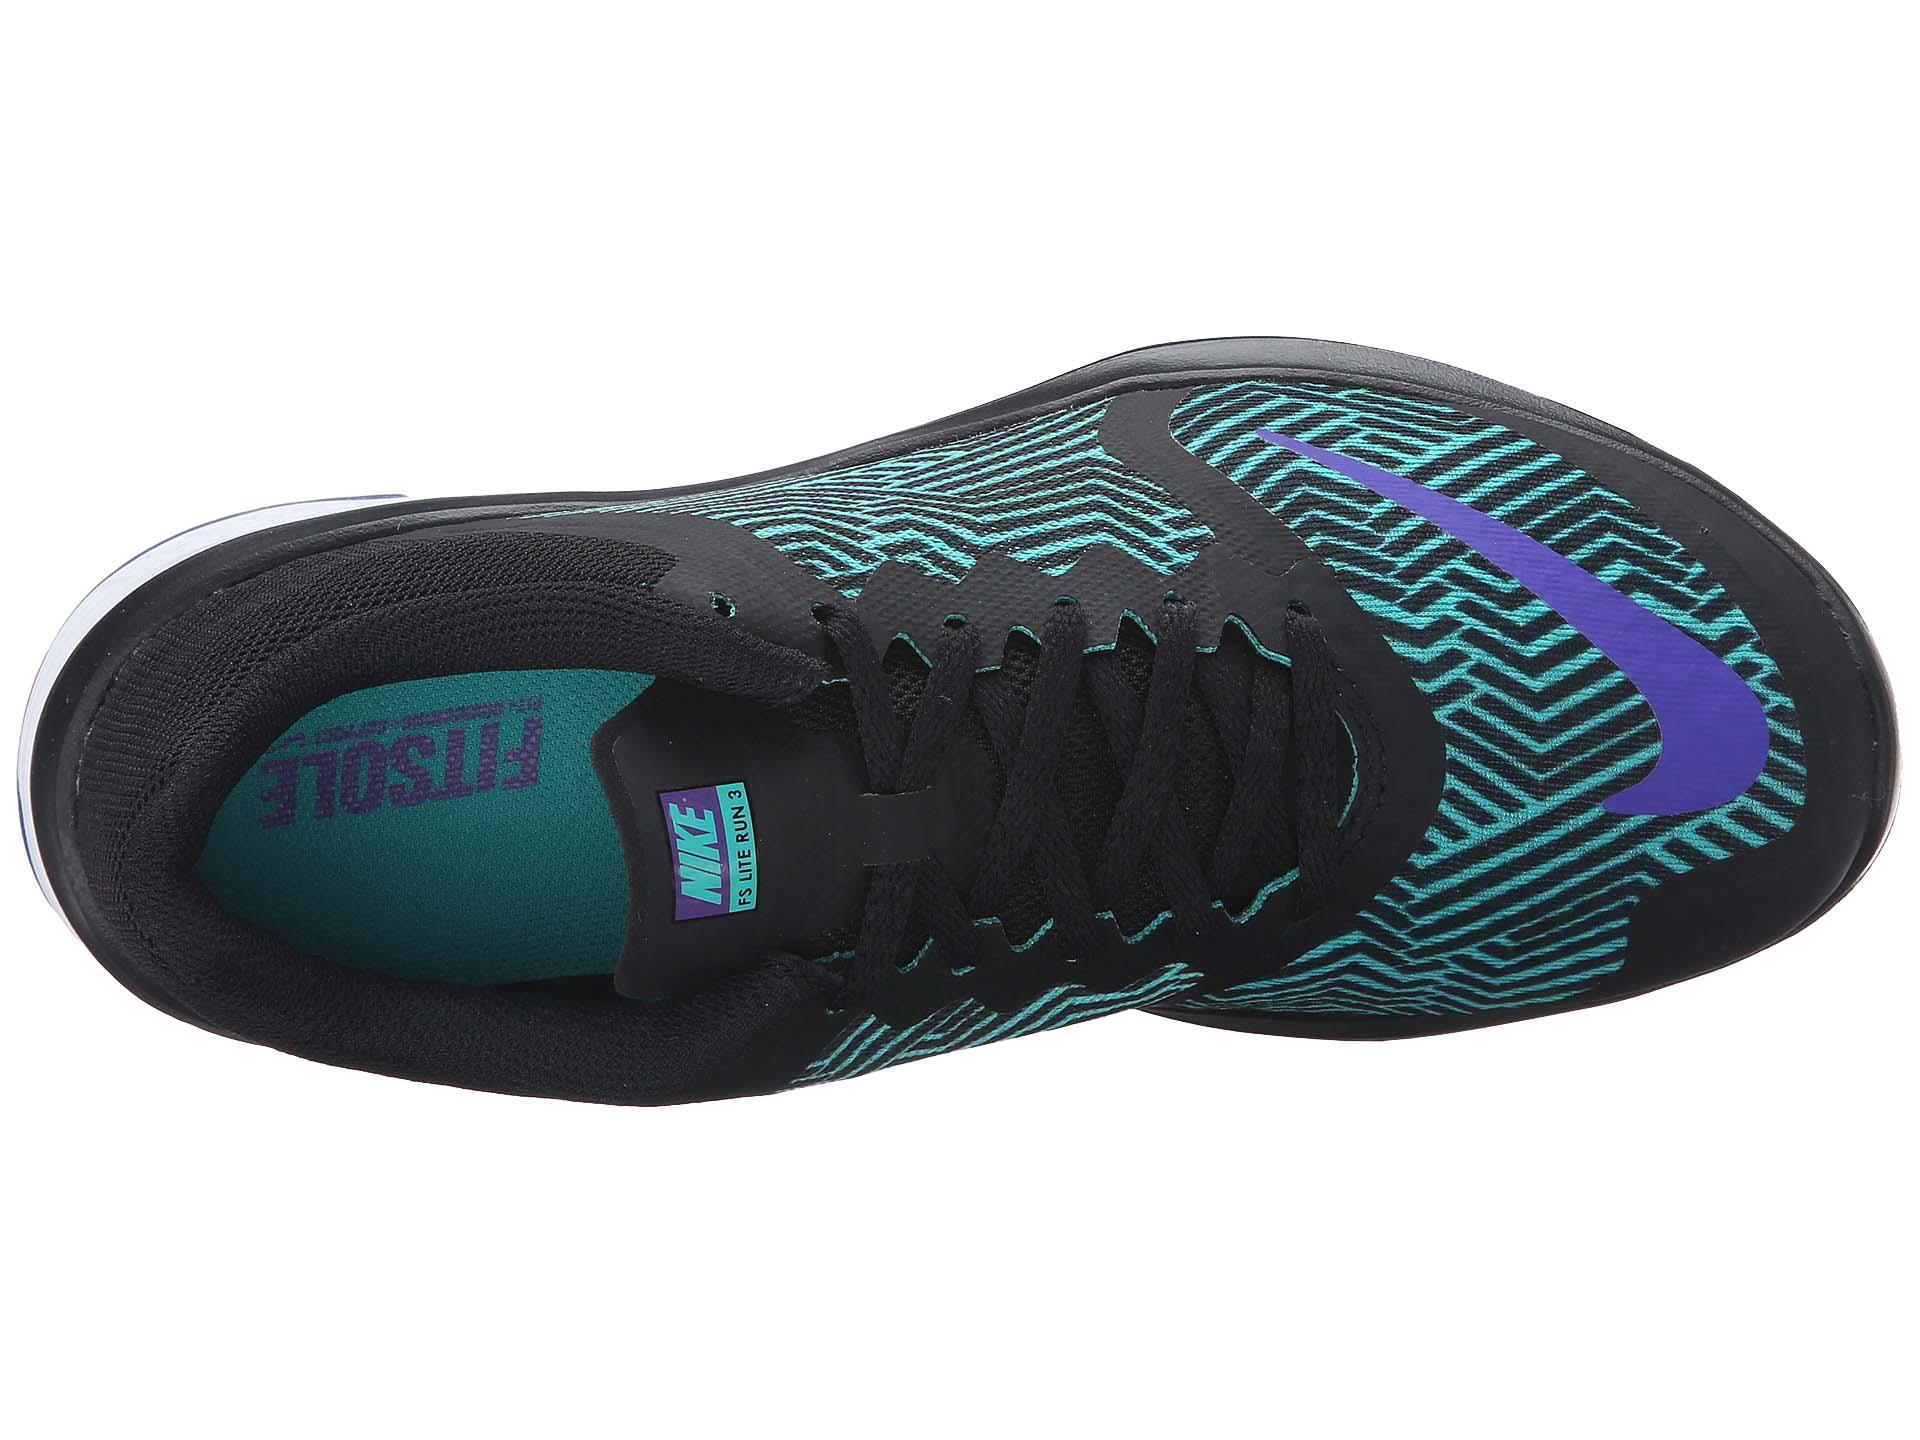 Nike Women's Fs Lite Run Purple/Clear 3 Premium W Black/Fierce Purple/Clear Run Jade/White Ankle-High Walking Shoe - 9M 207bcb